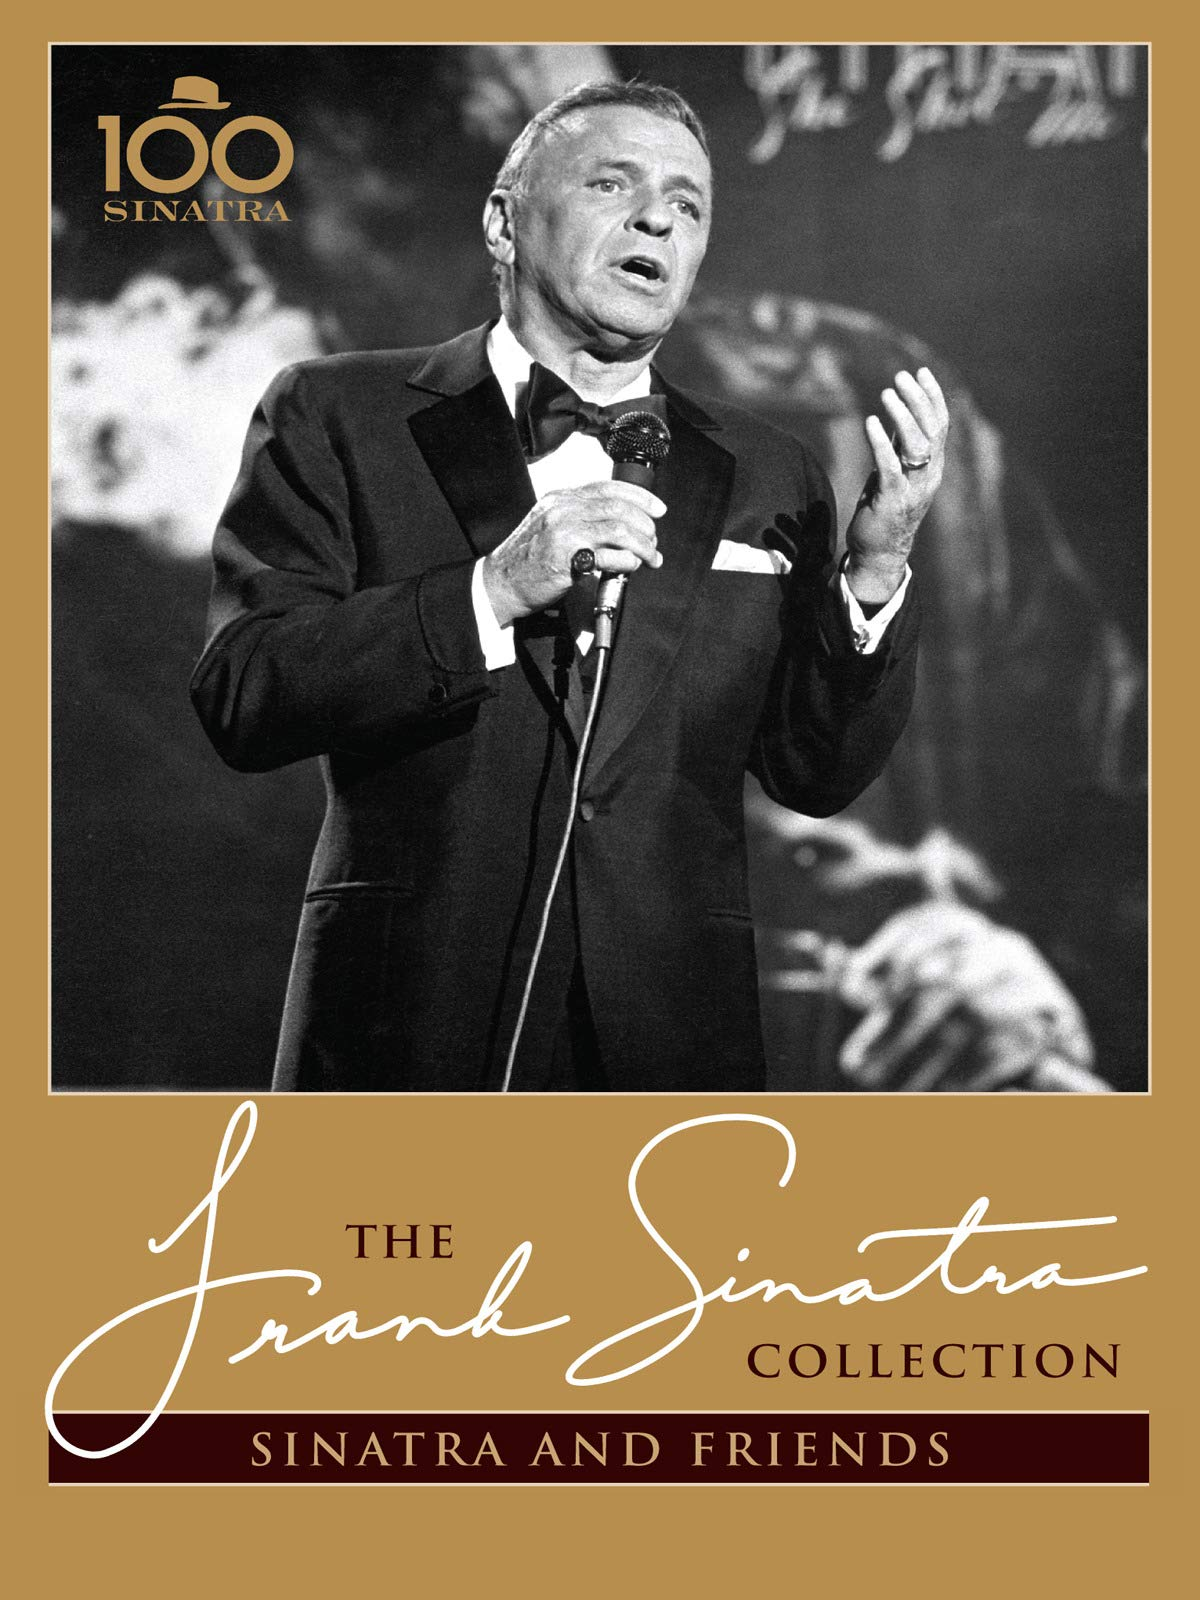 Frank Sinatra - Sinatra & Friends